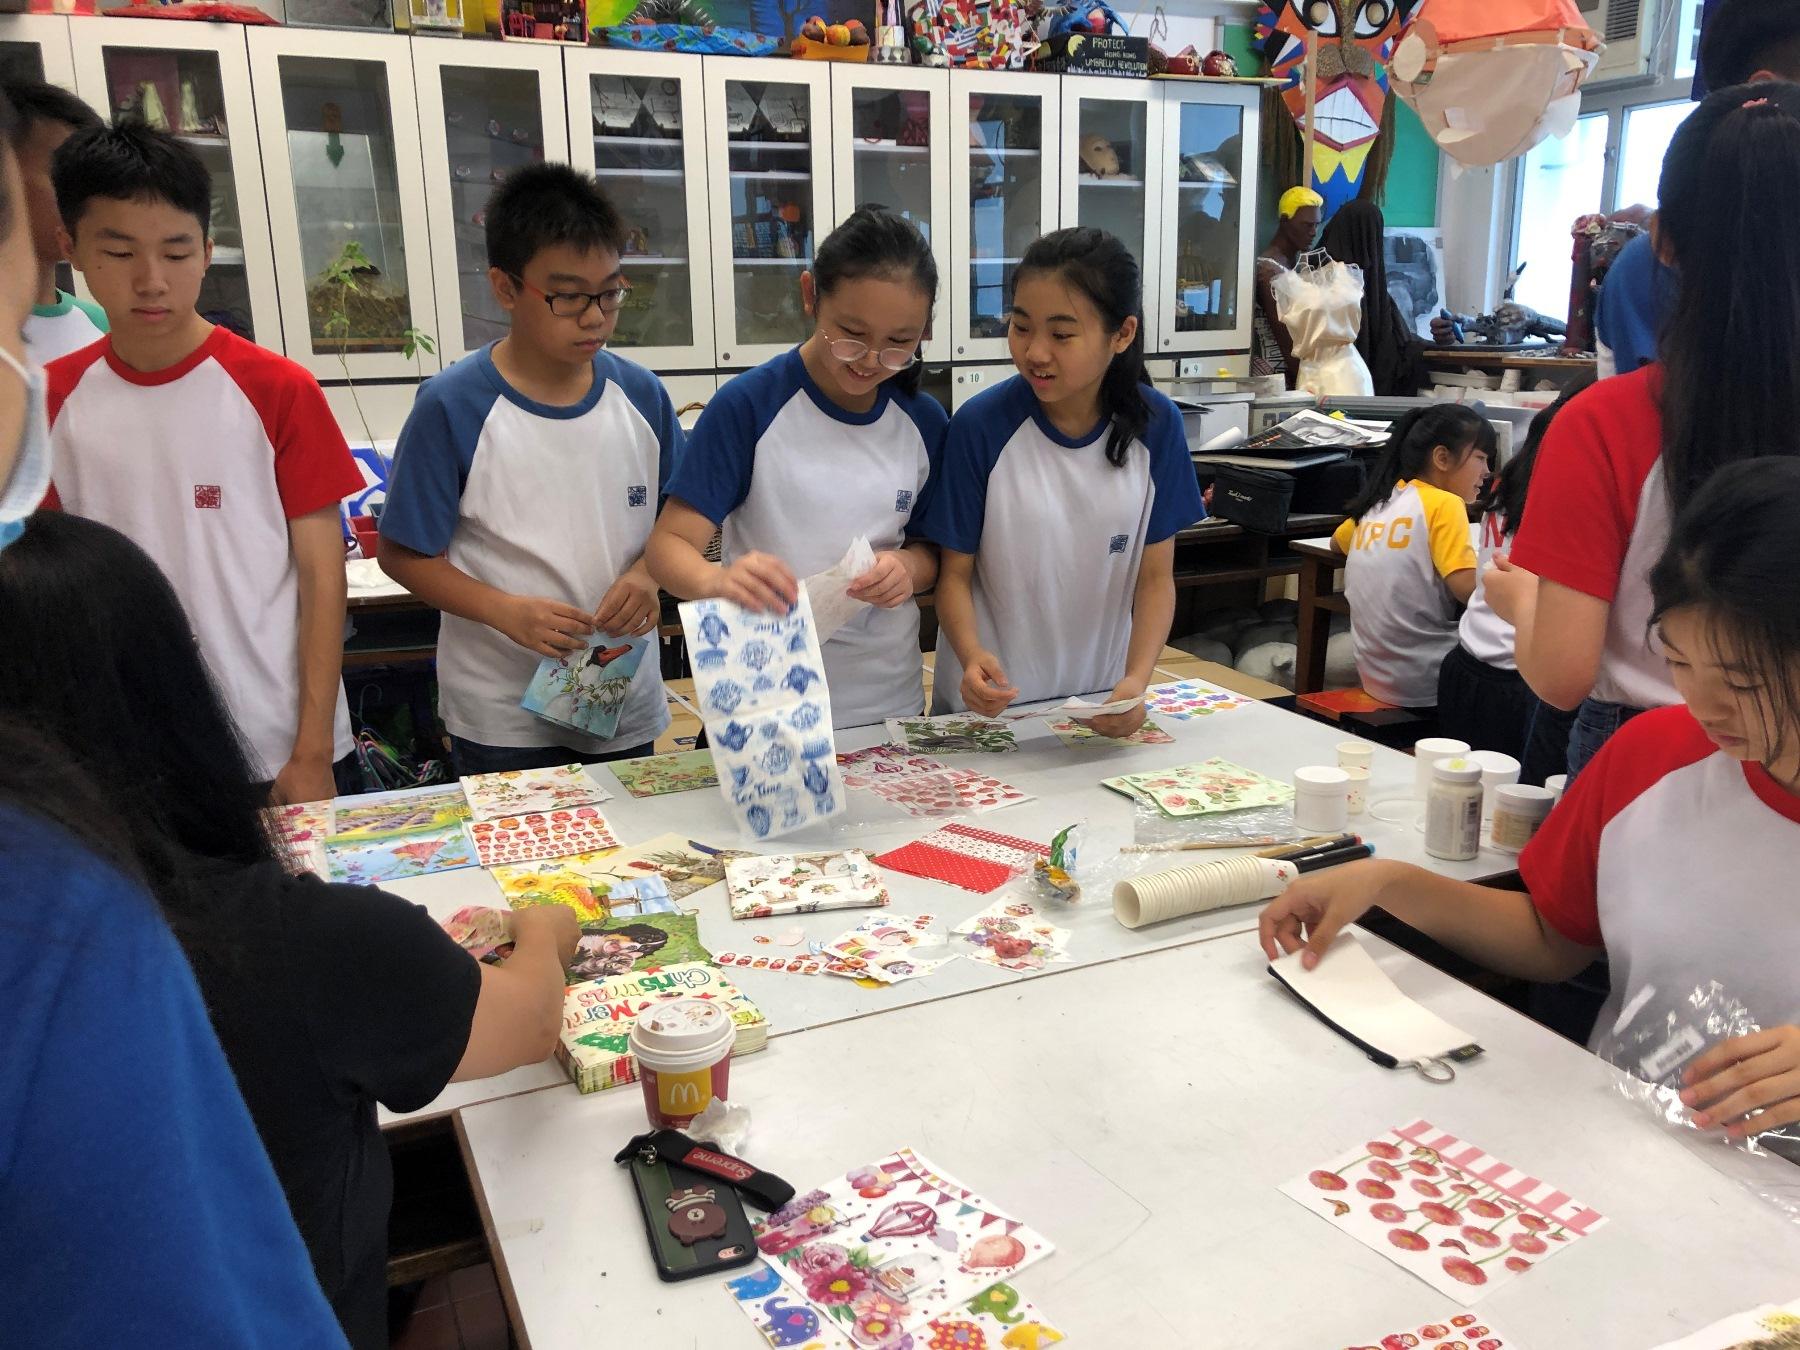 http://npc.edu.hk/sites/default/files/img_6959_1.jpg